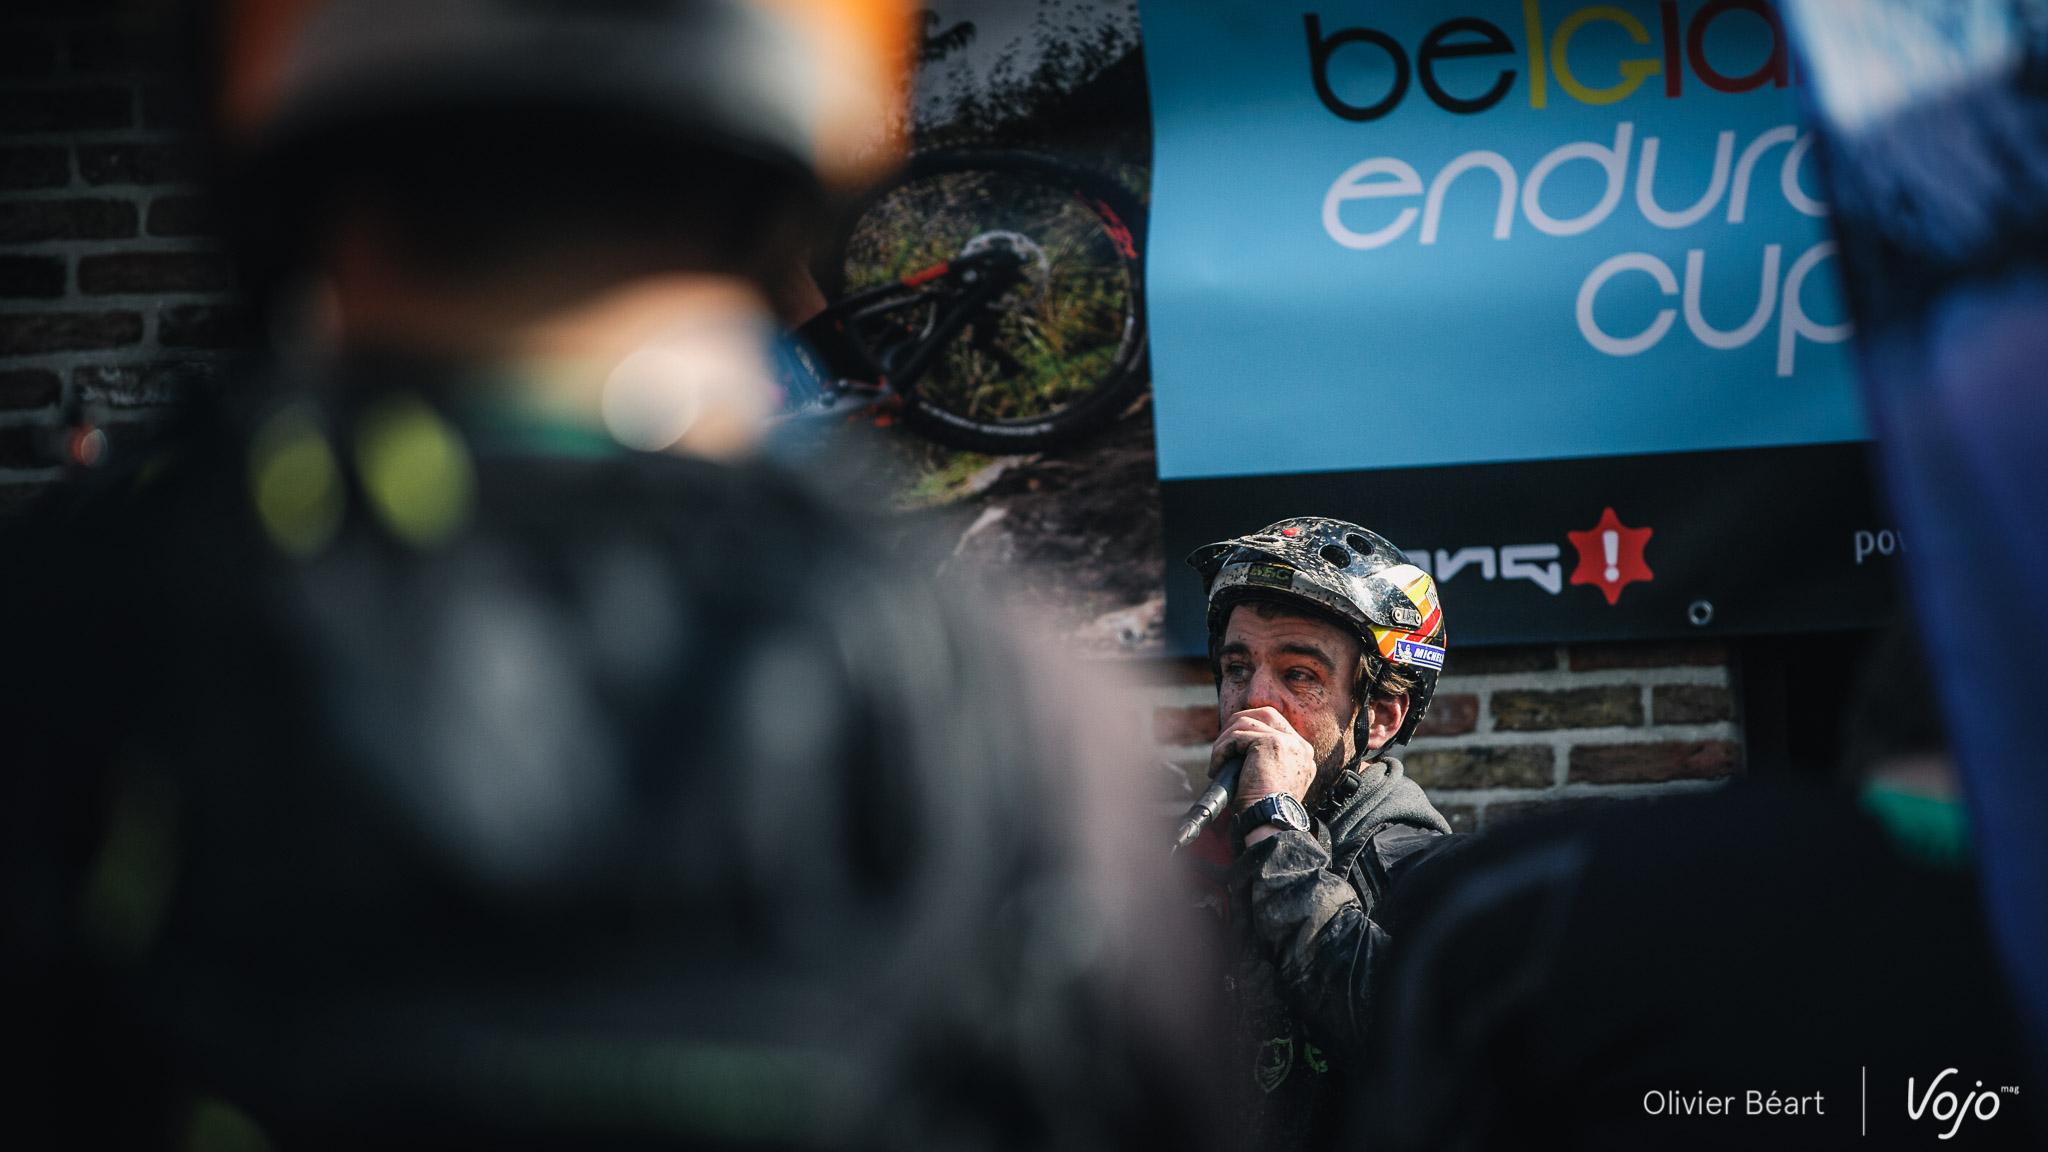 Belgian_Enduro_Cup_Mont_Enclus_Copyright_OBeart_Vojomag-1-3